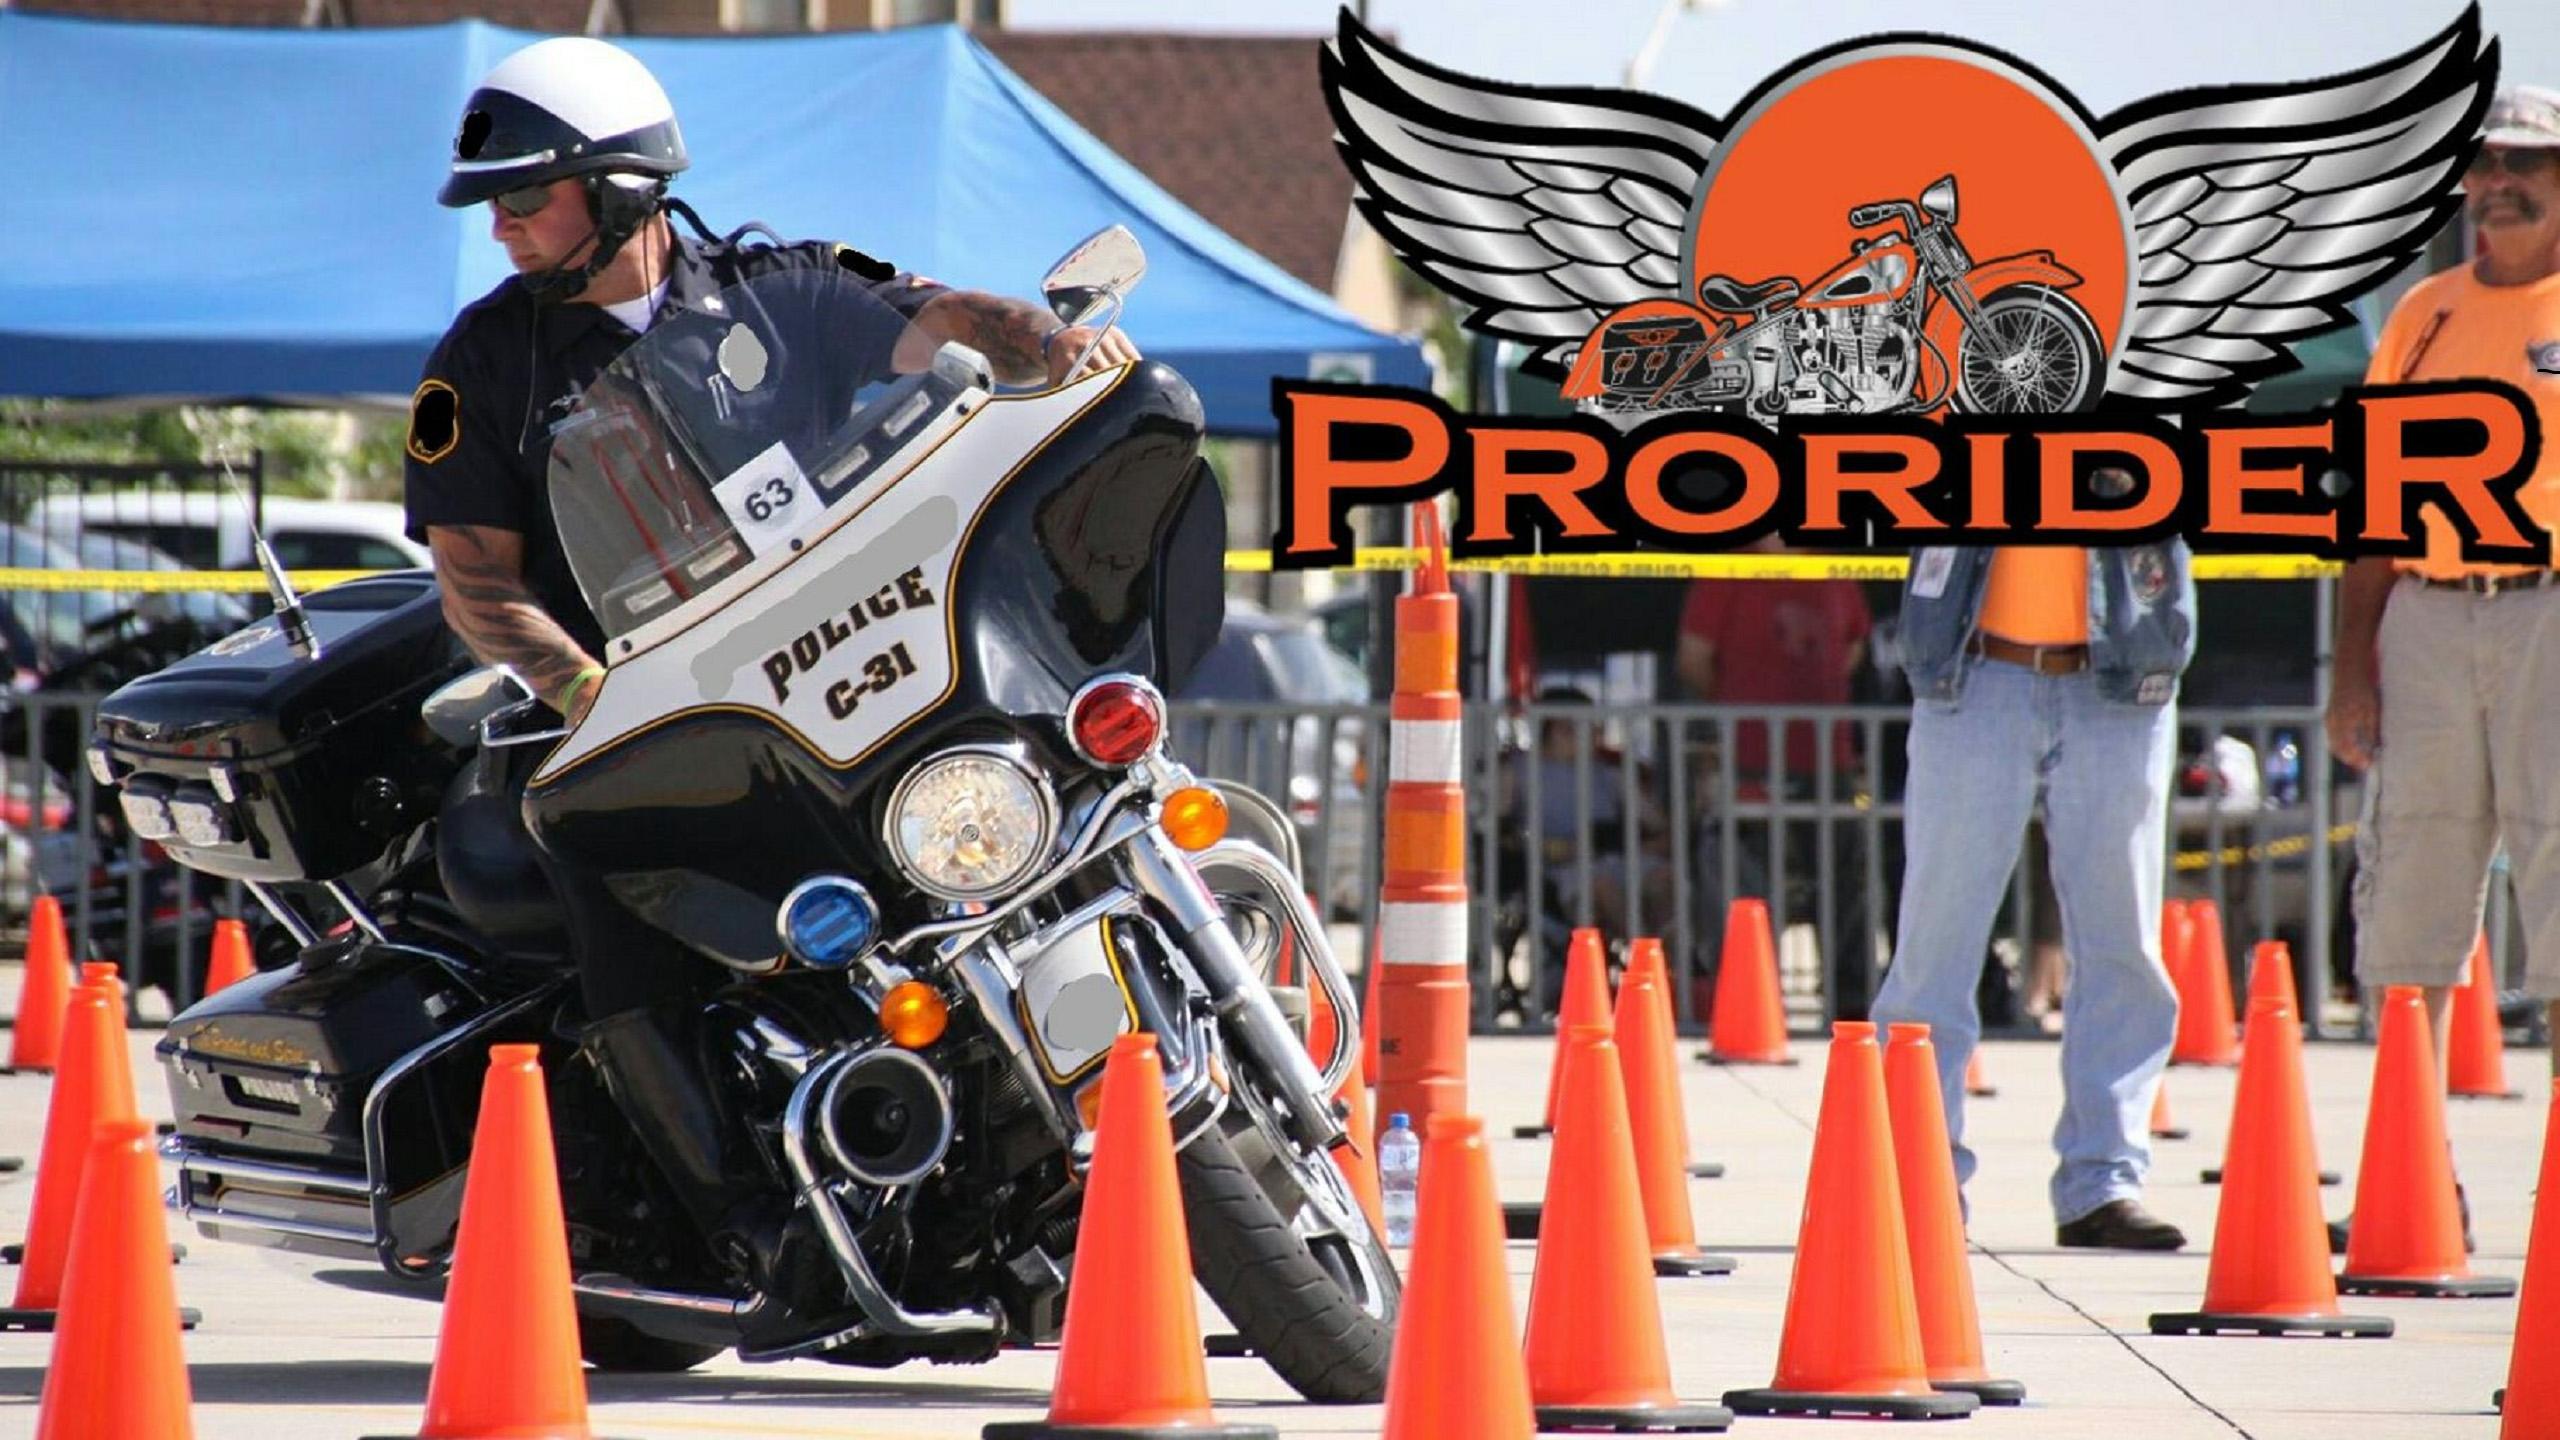 Harley Davidson Motorcycle Riding Classes Near Me